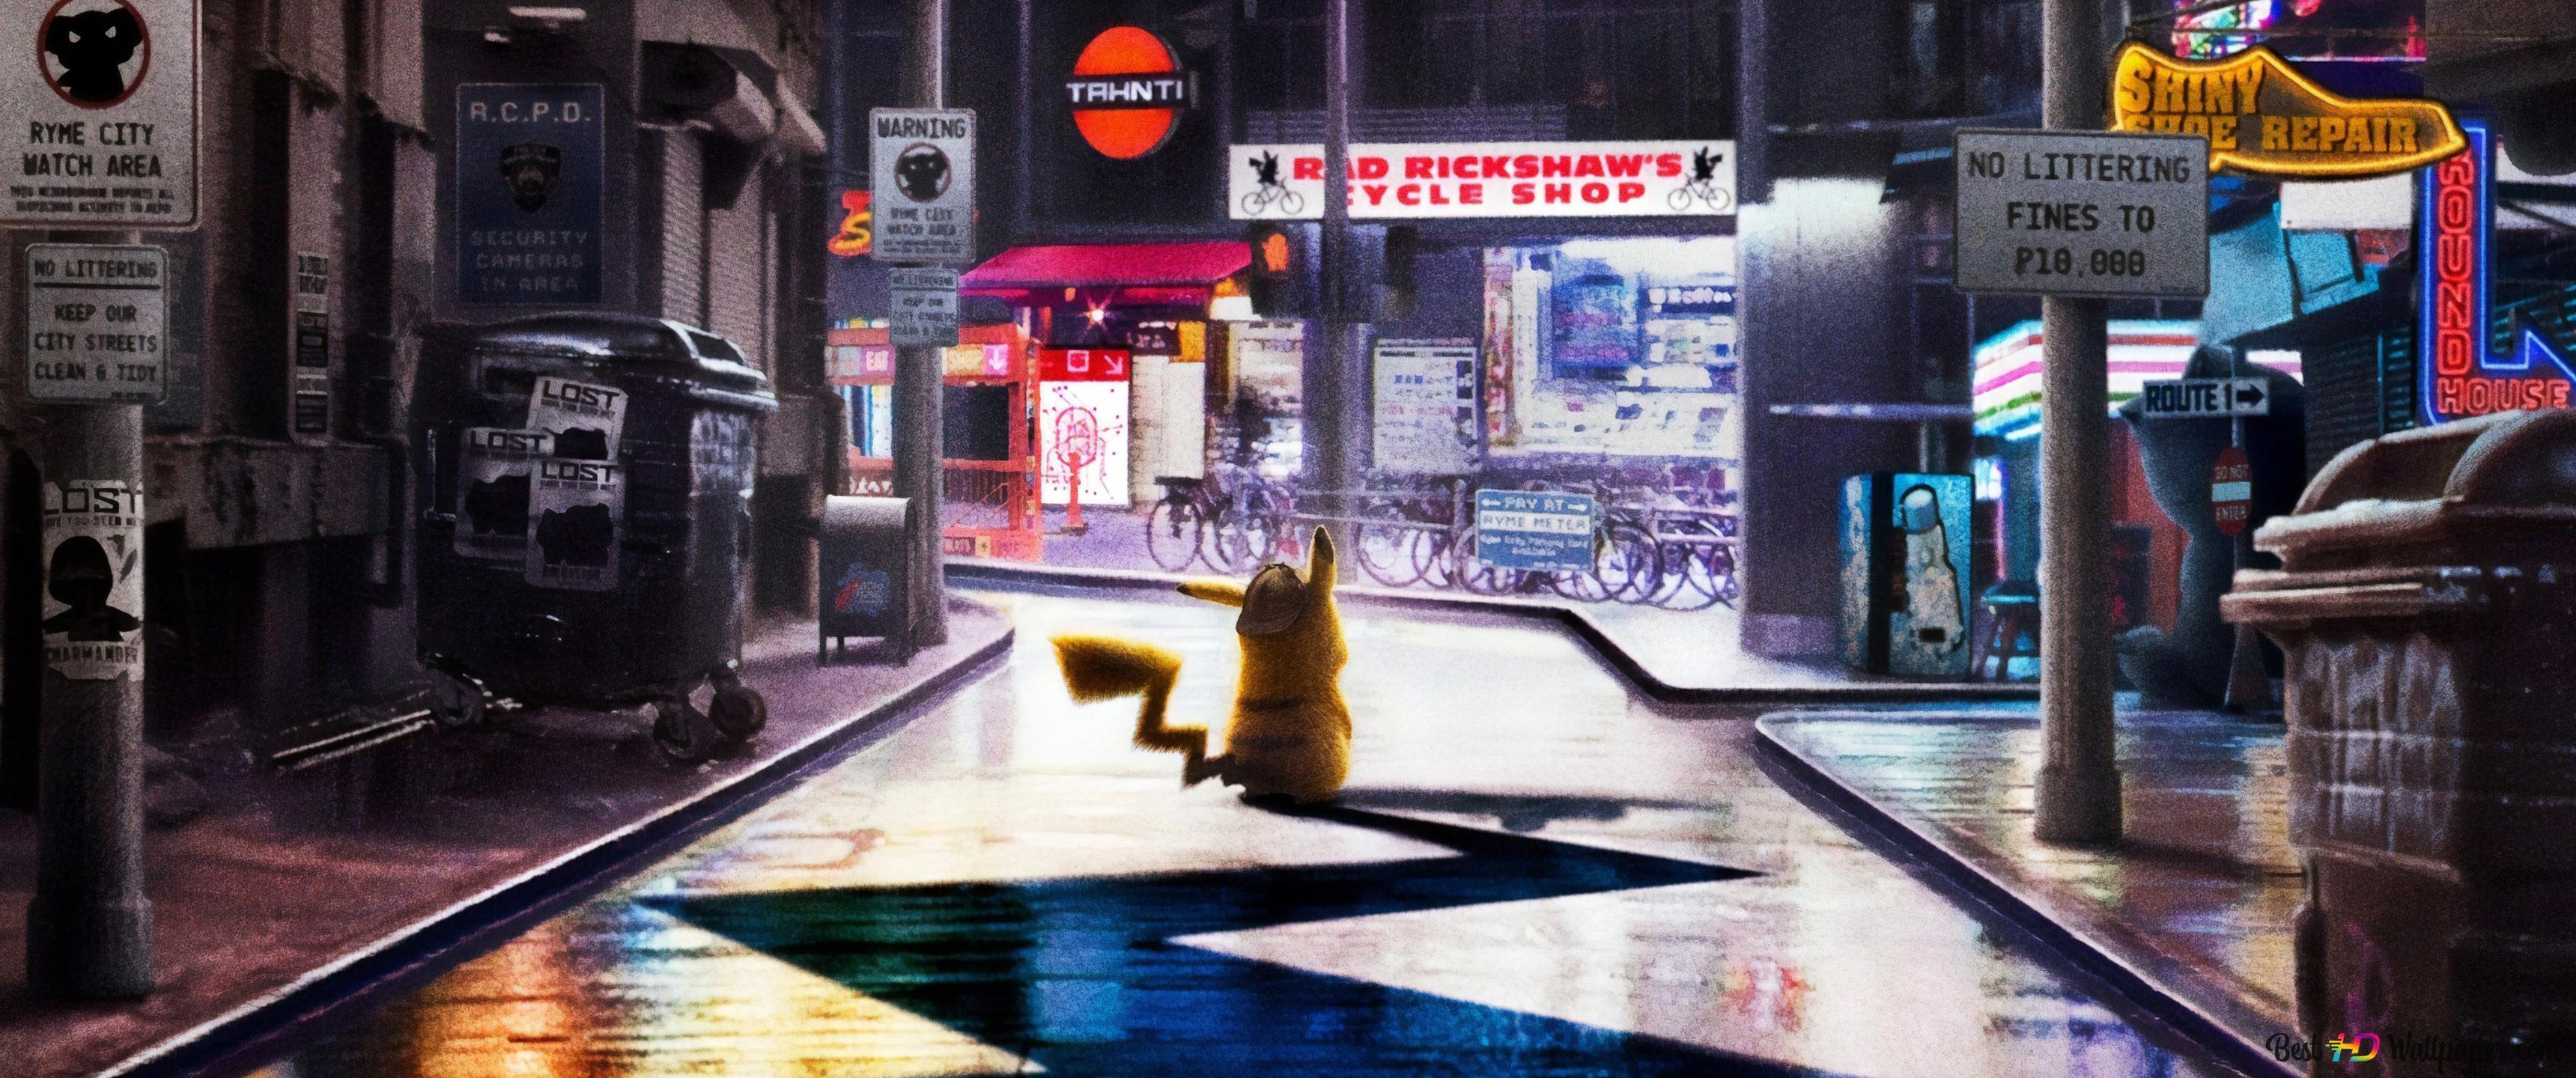 Descargar Fondo De Pantalla Pokemon Detective Pikachu Hd